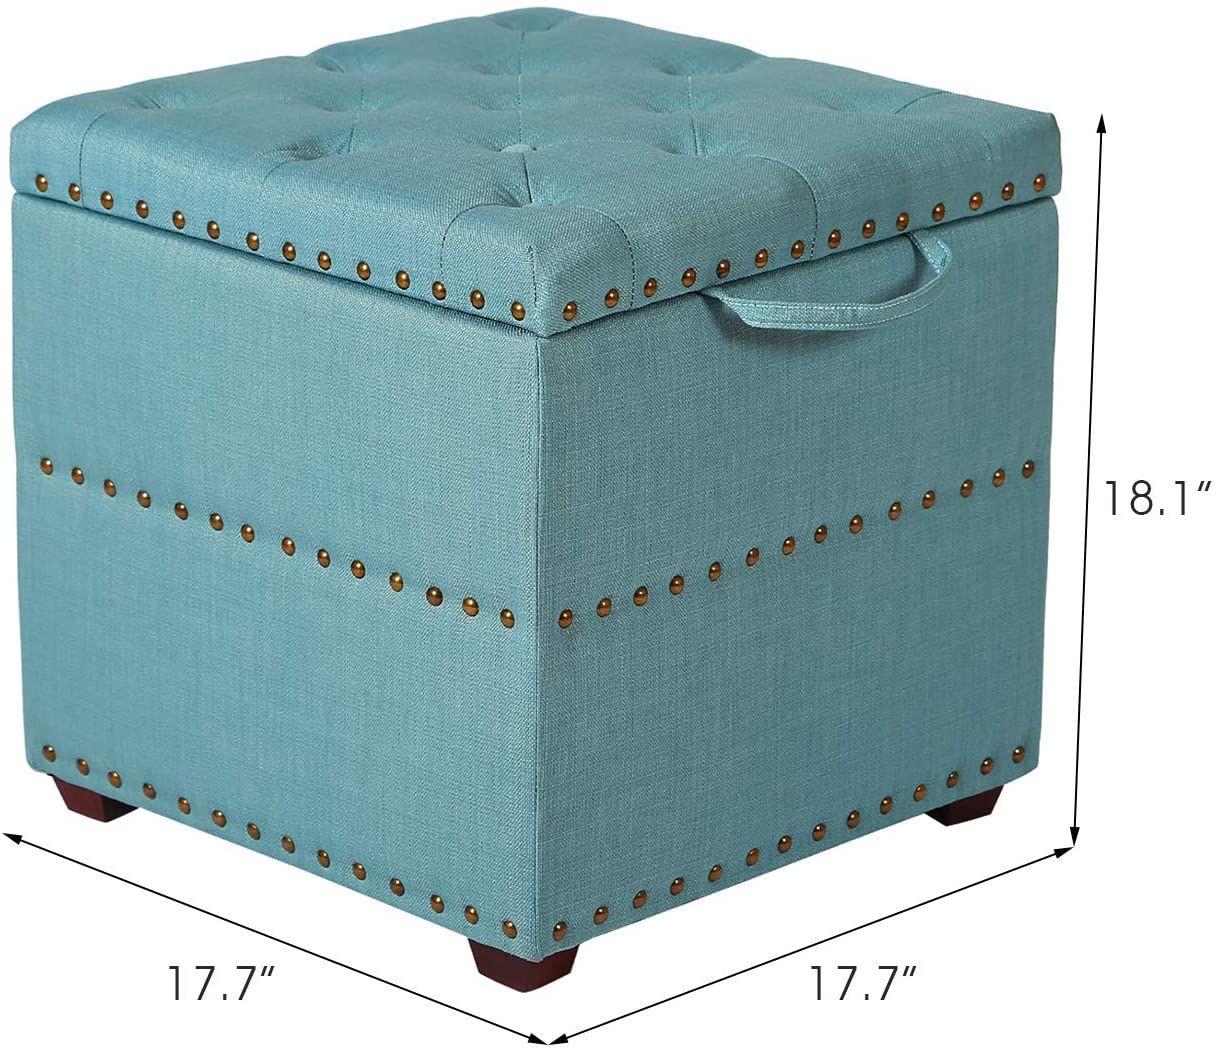 edeco storage ottoman bench with tray